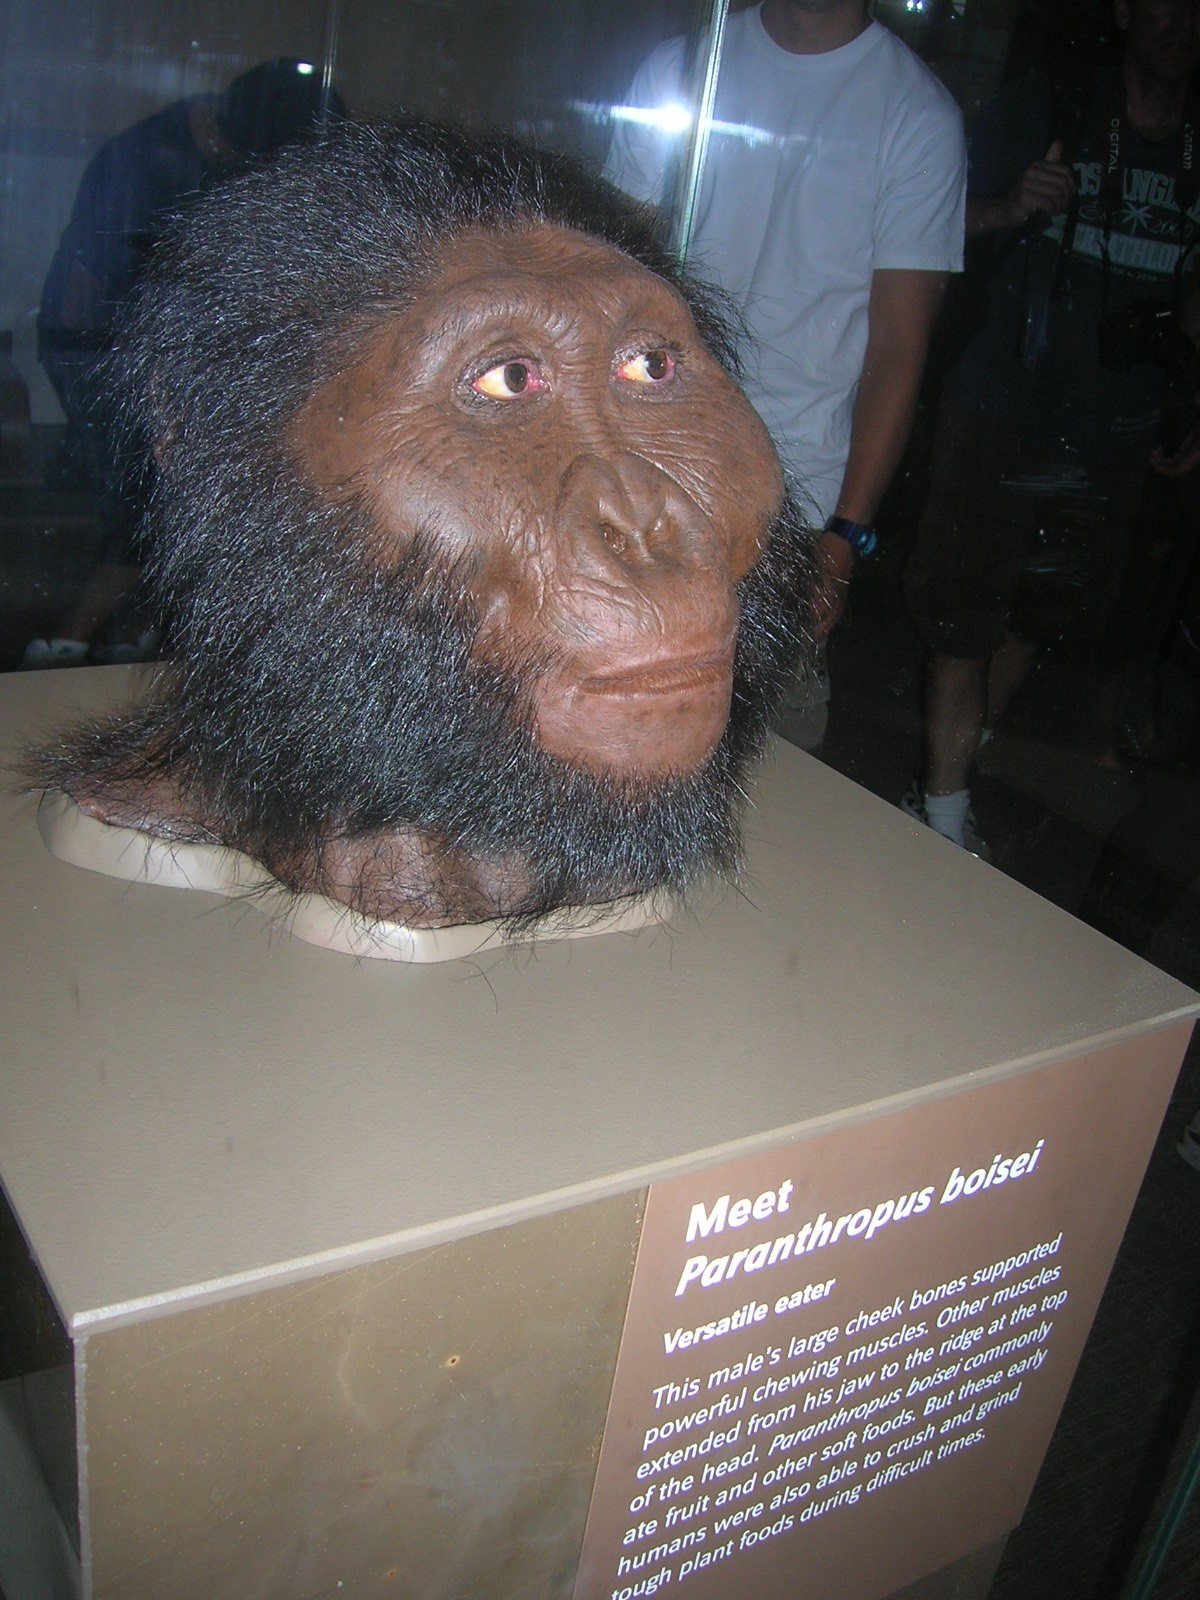 Paranthropus boisei (skull pictured in first photo in post)